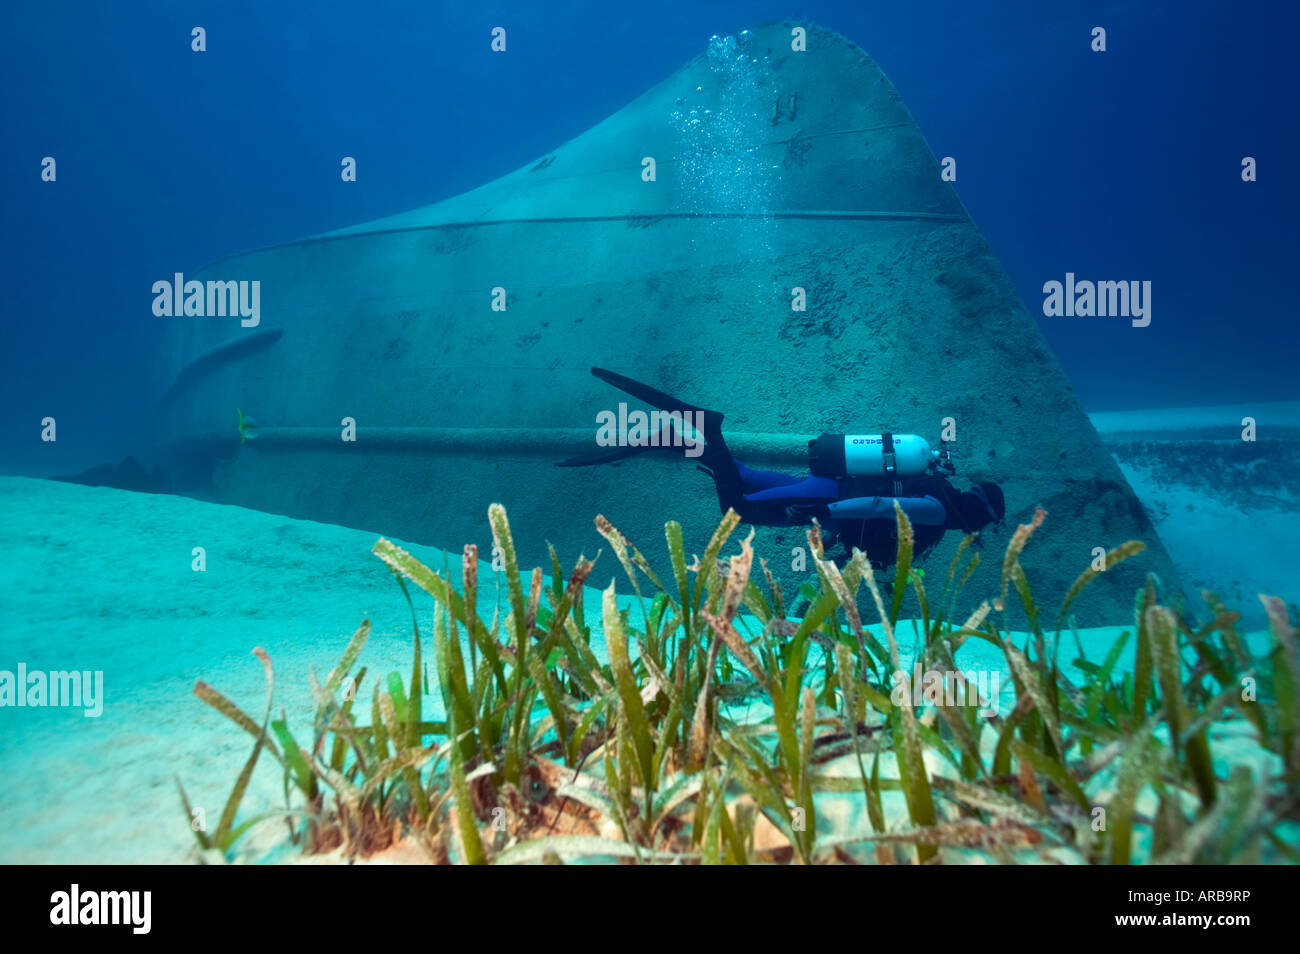 Diver surveys Alma B shipwreck near Cat Cay Bahamas Islands - Stock Image